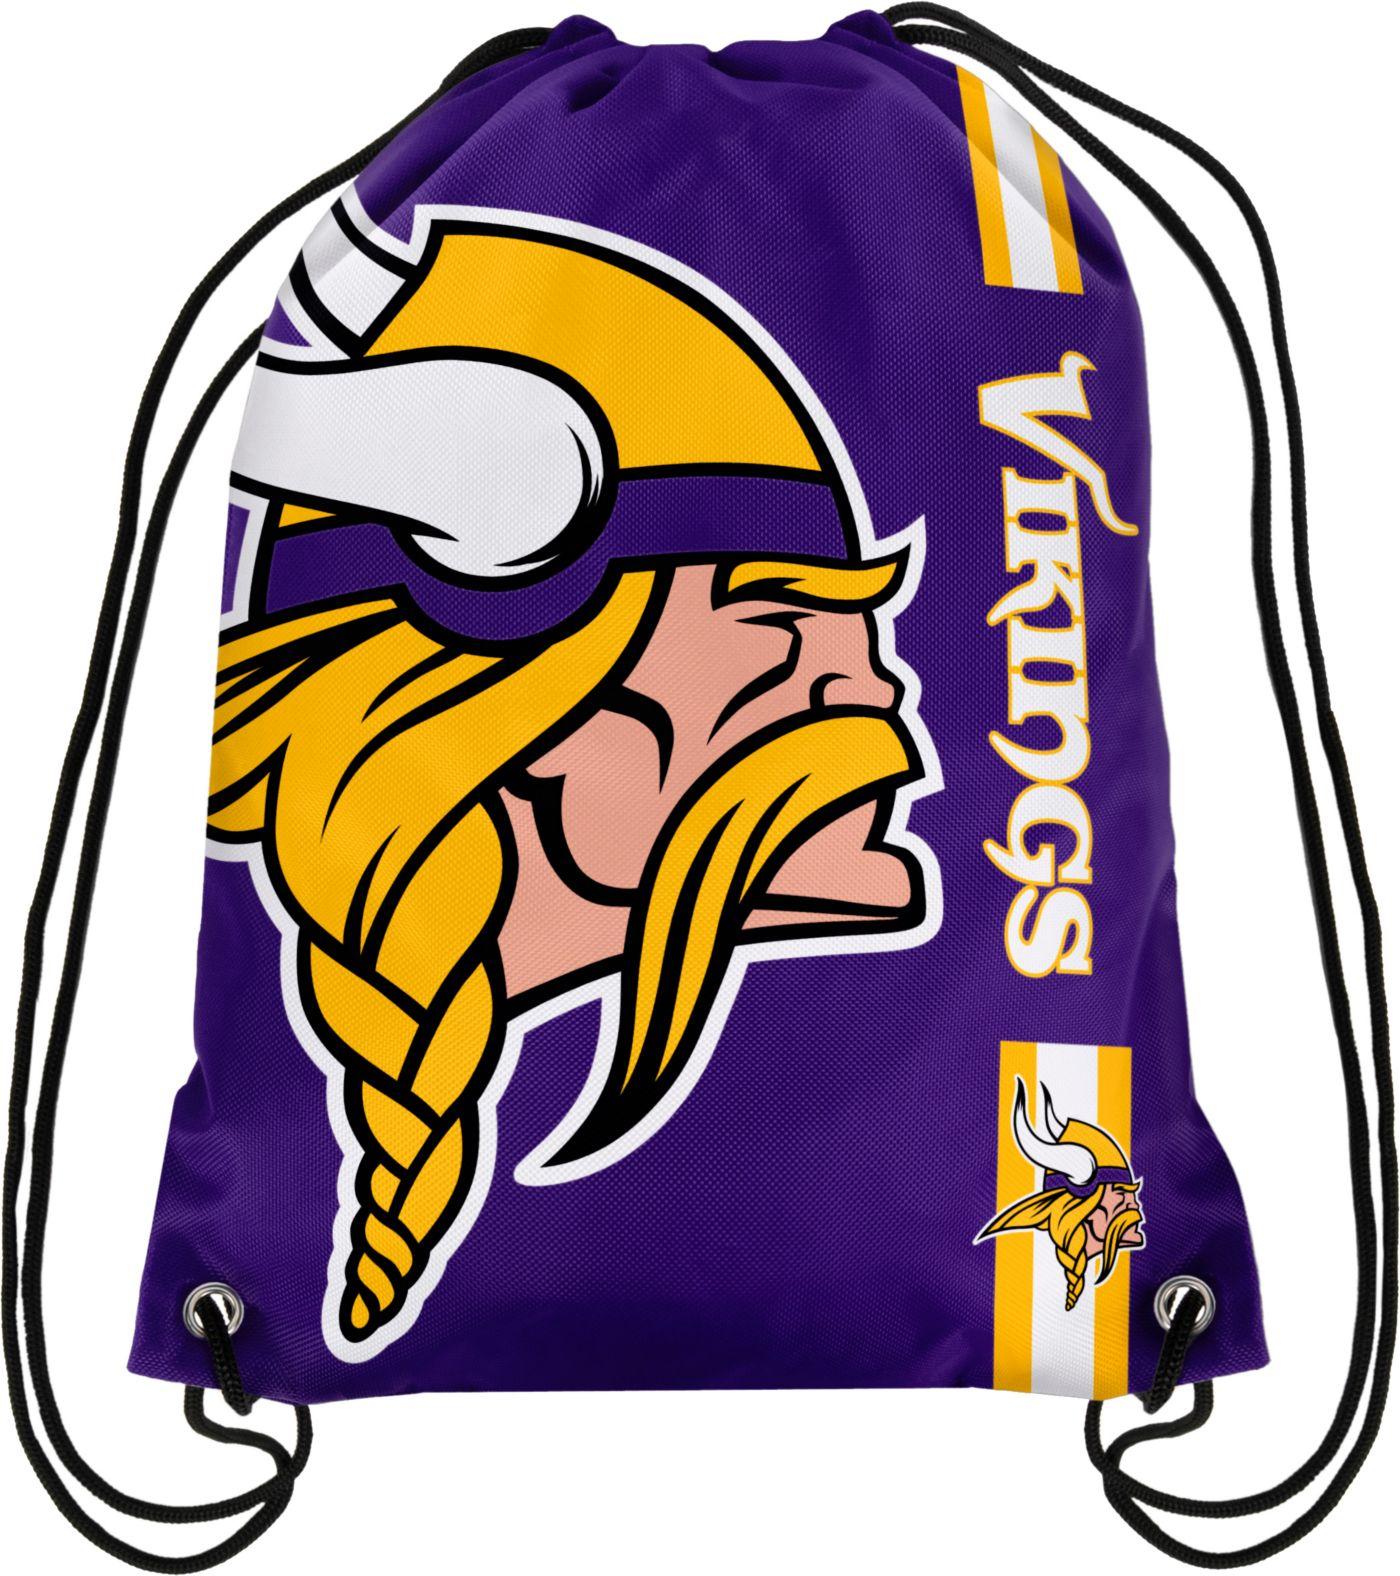 FOCO Minnesota Vikings String Pack